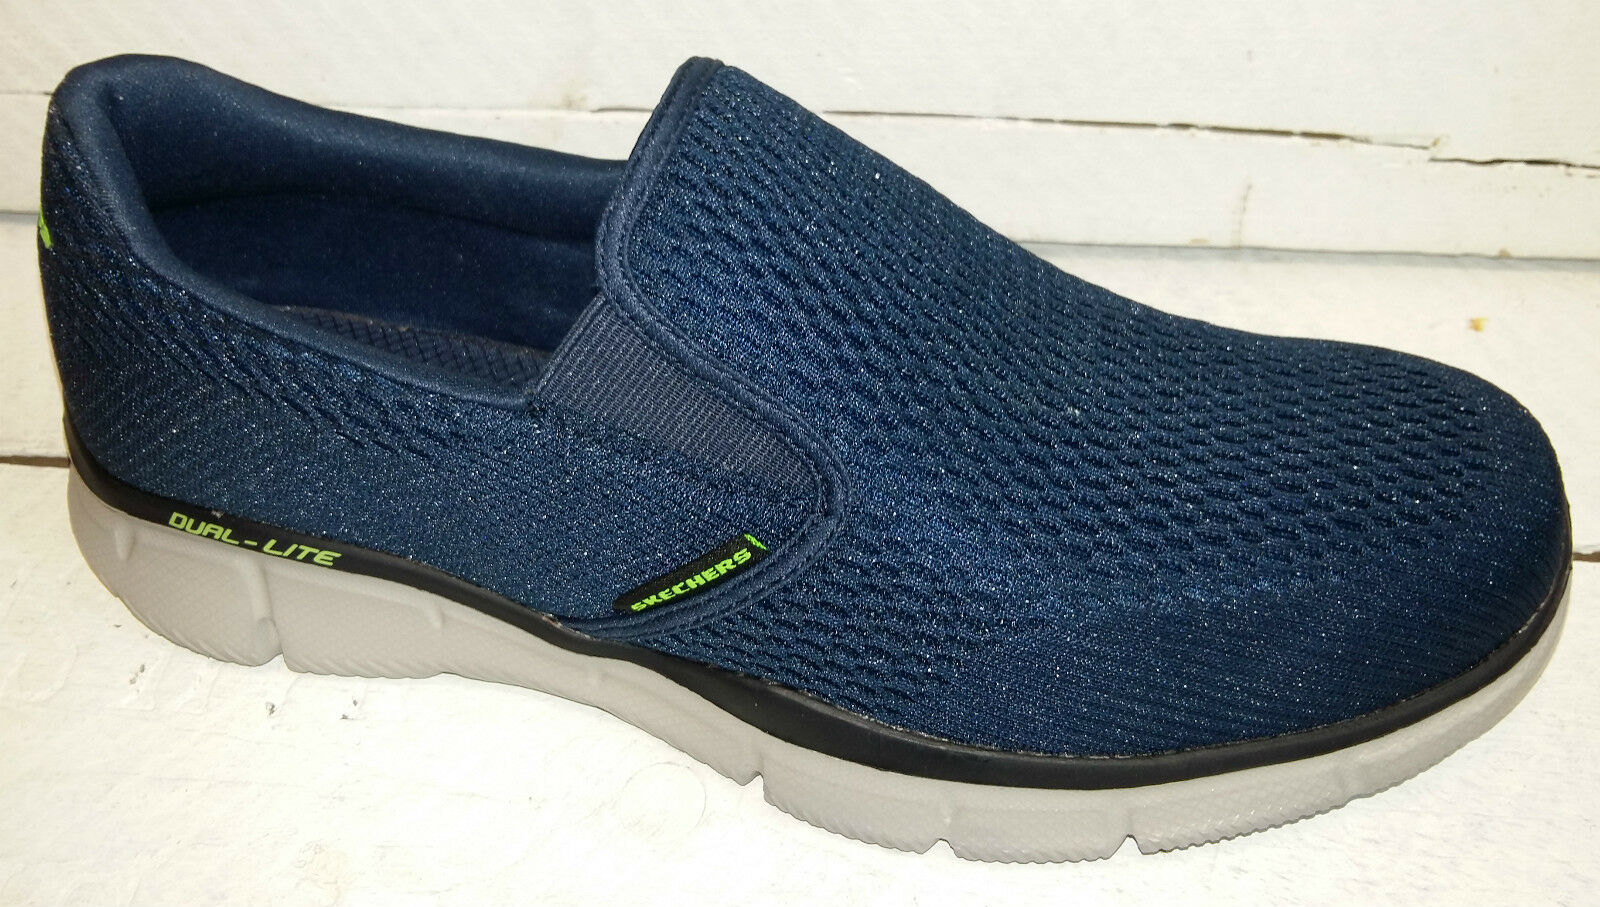 Hombres Skechers Double Slip Play Navy Slip Double On zapatos c8e96f